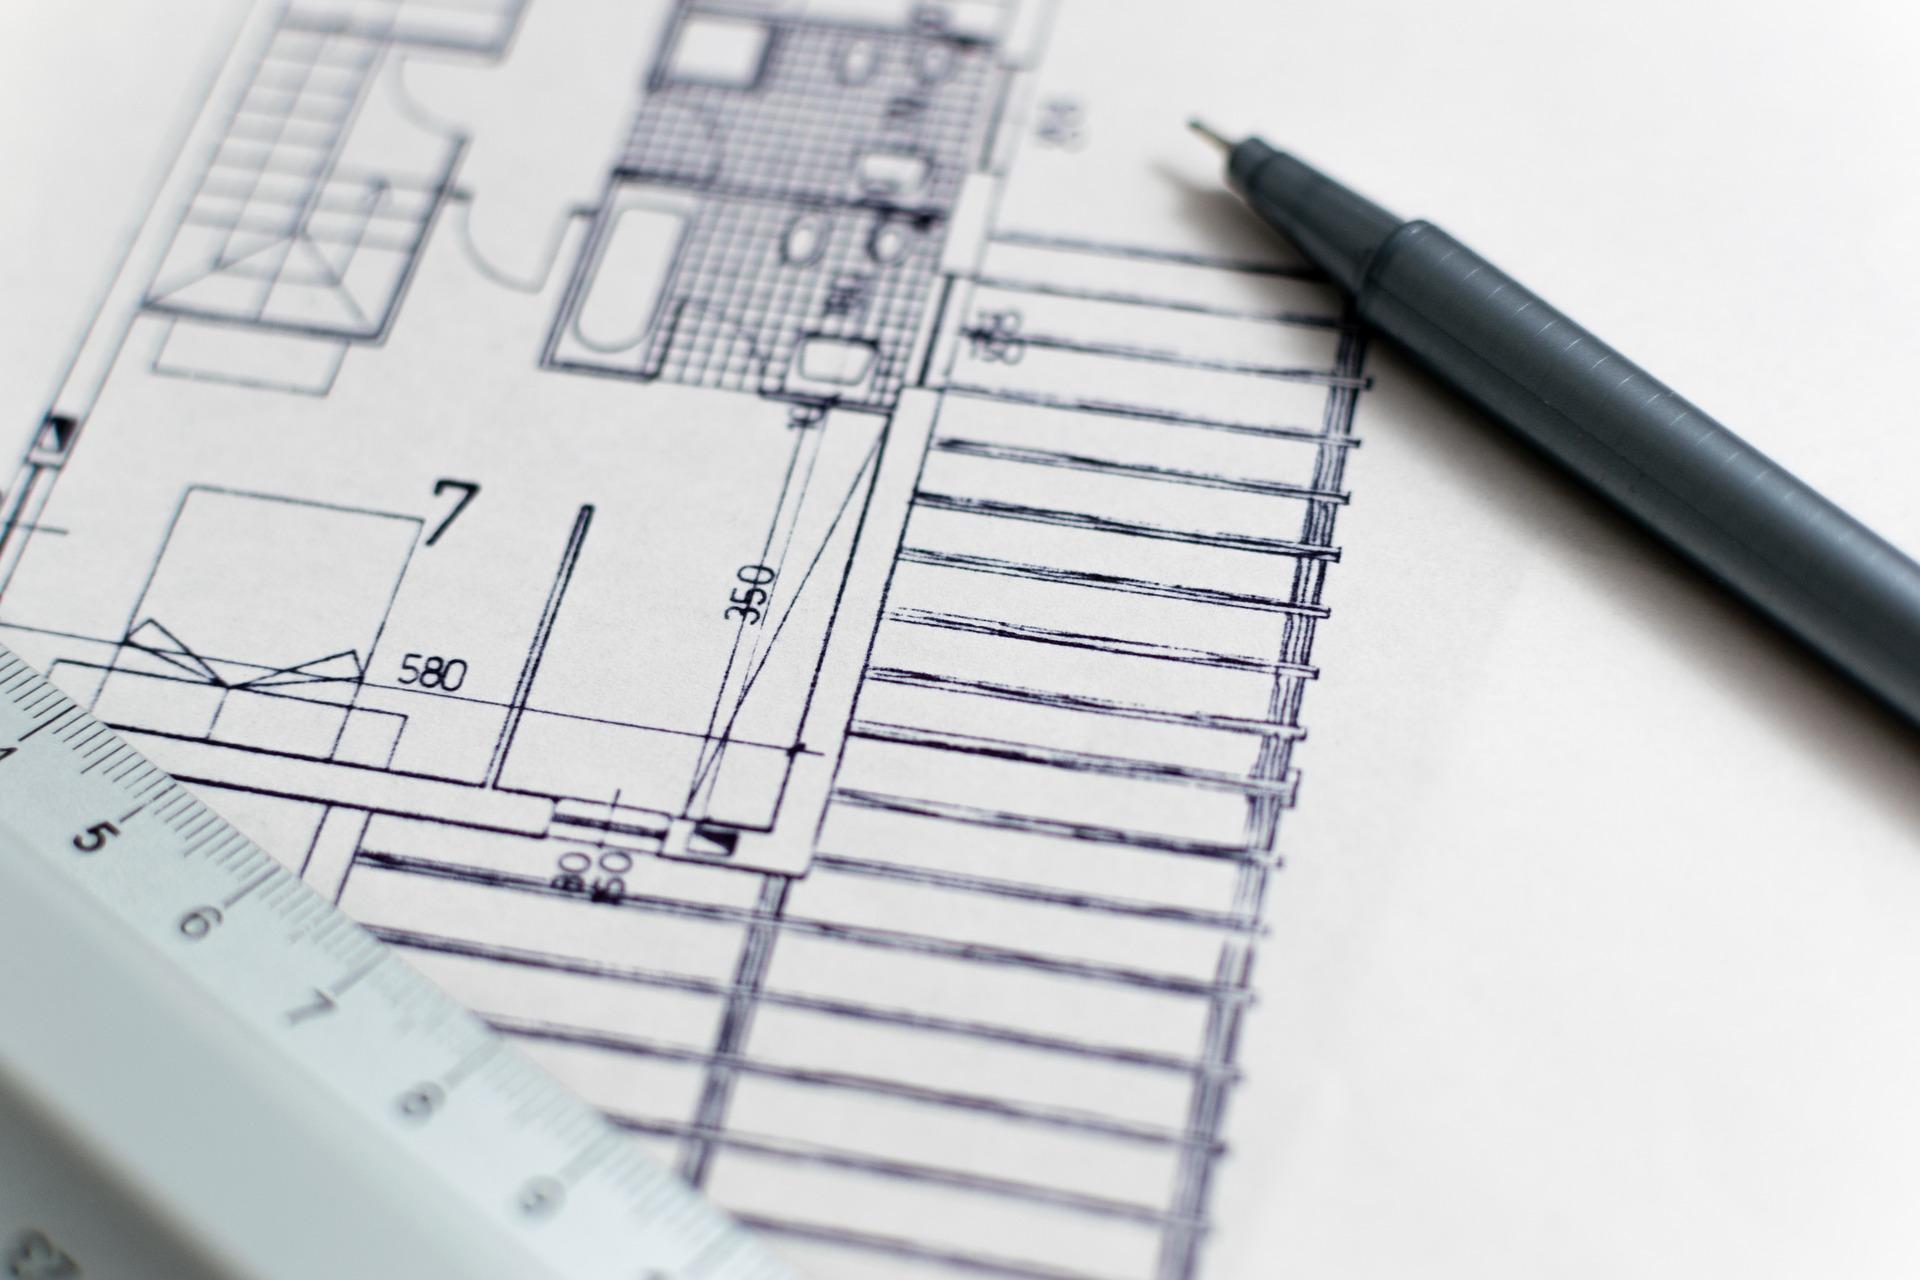 tipps f r den hausbau magazin bautrocknung duregger. Black Bedroom Furniture Sets. Home Design Ideas